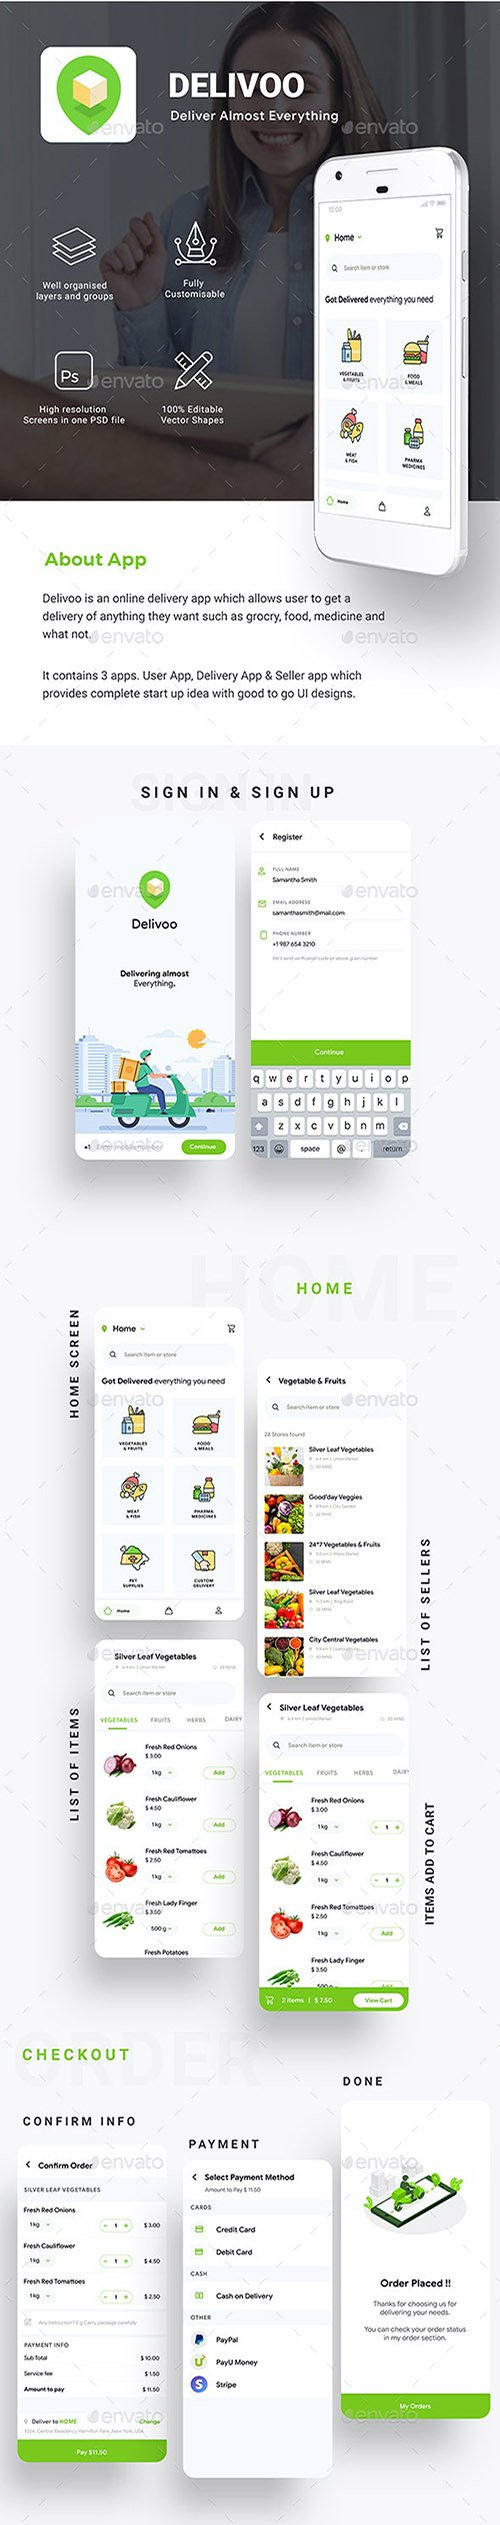 Moden Custom Delivery for Food, Grocery, Medicine etc. App UI | Delivoo 26442059